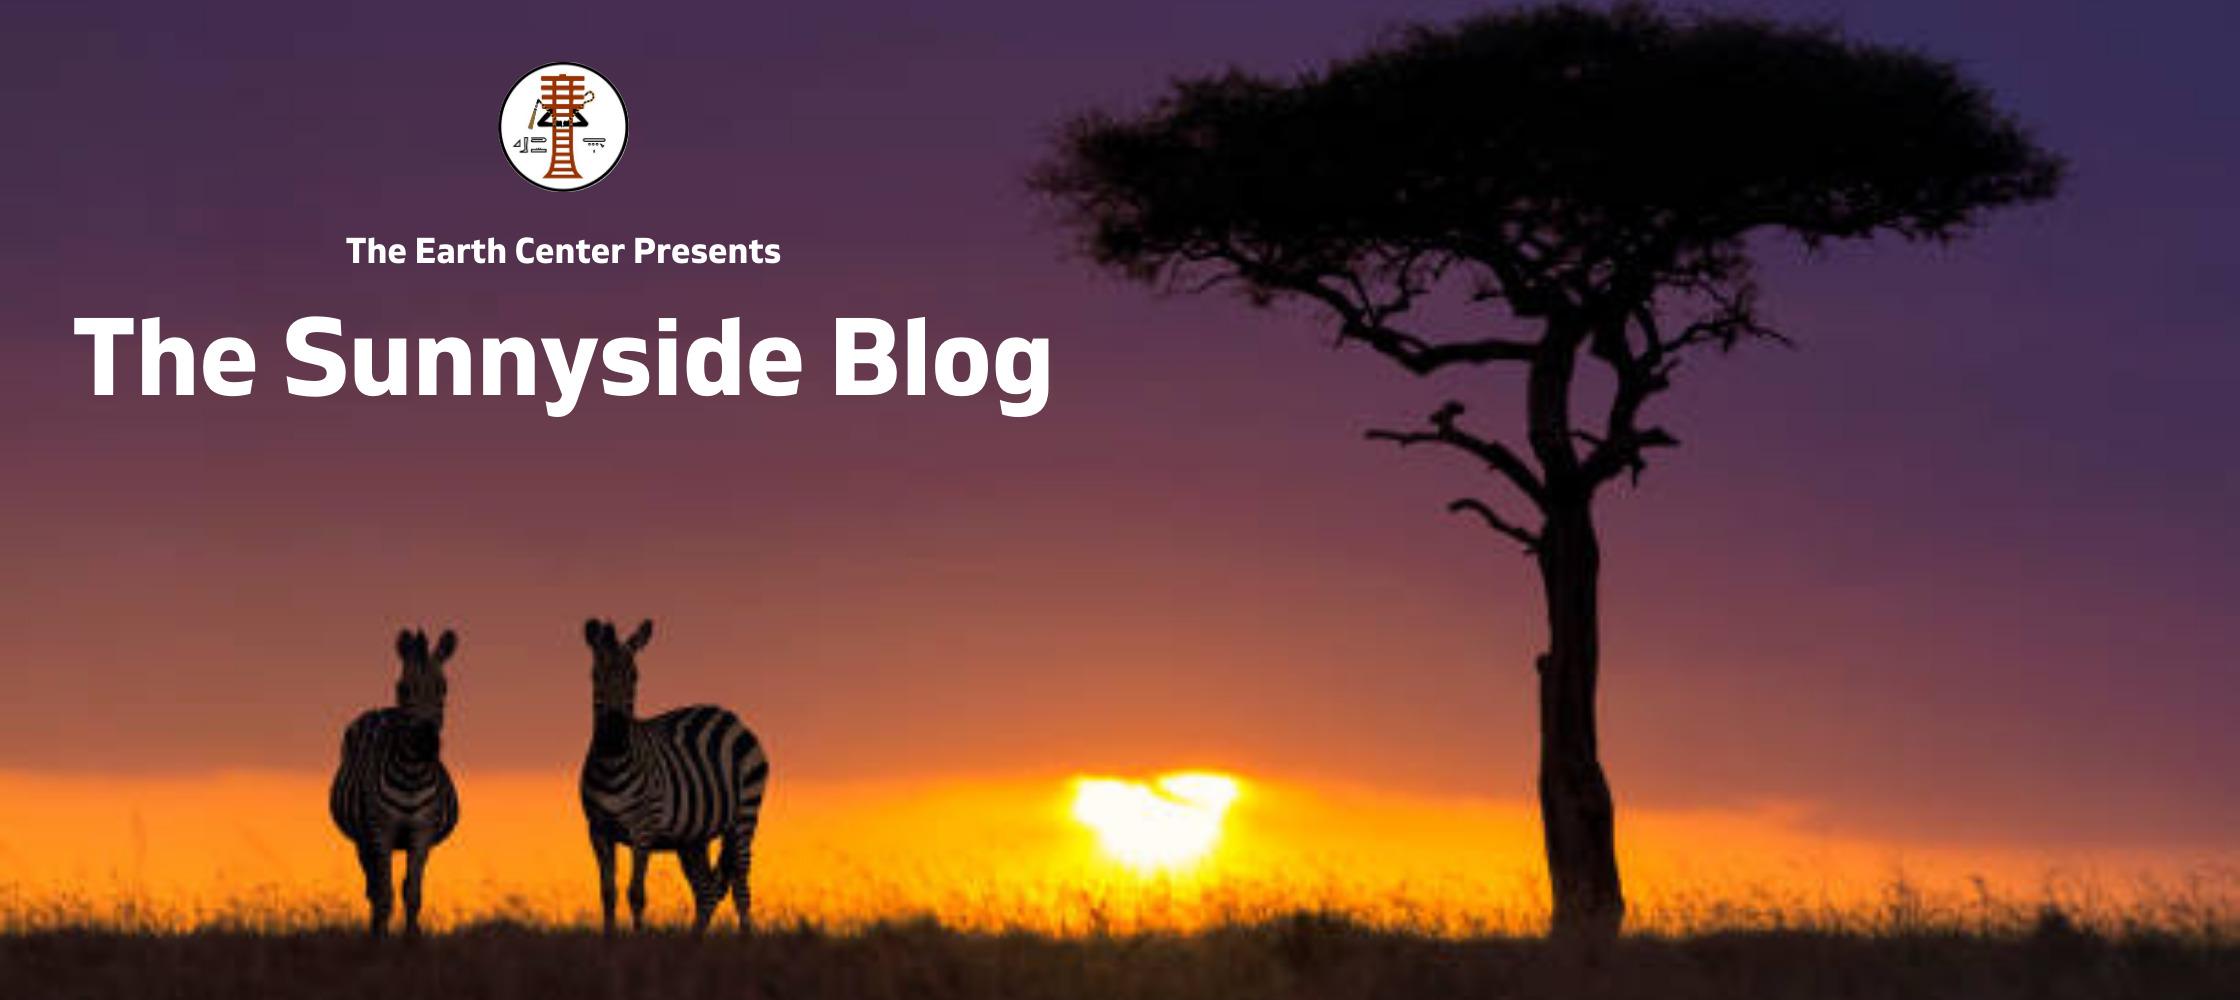 The Sunnyside Blog